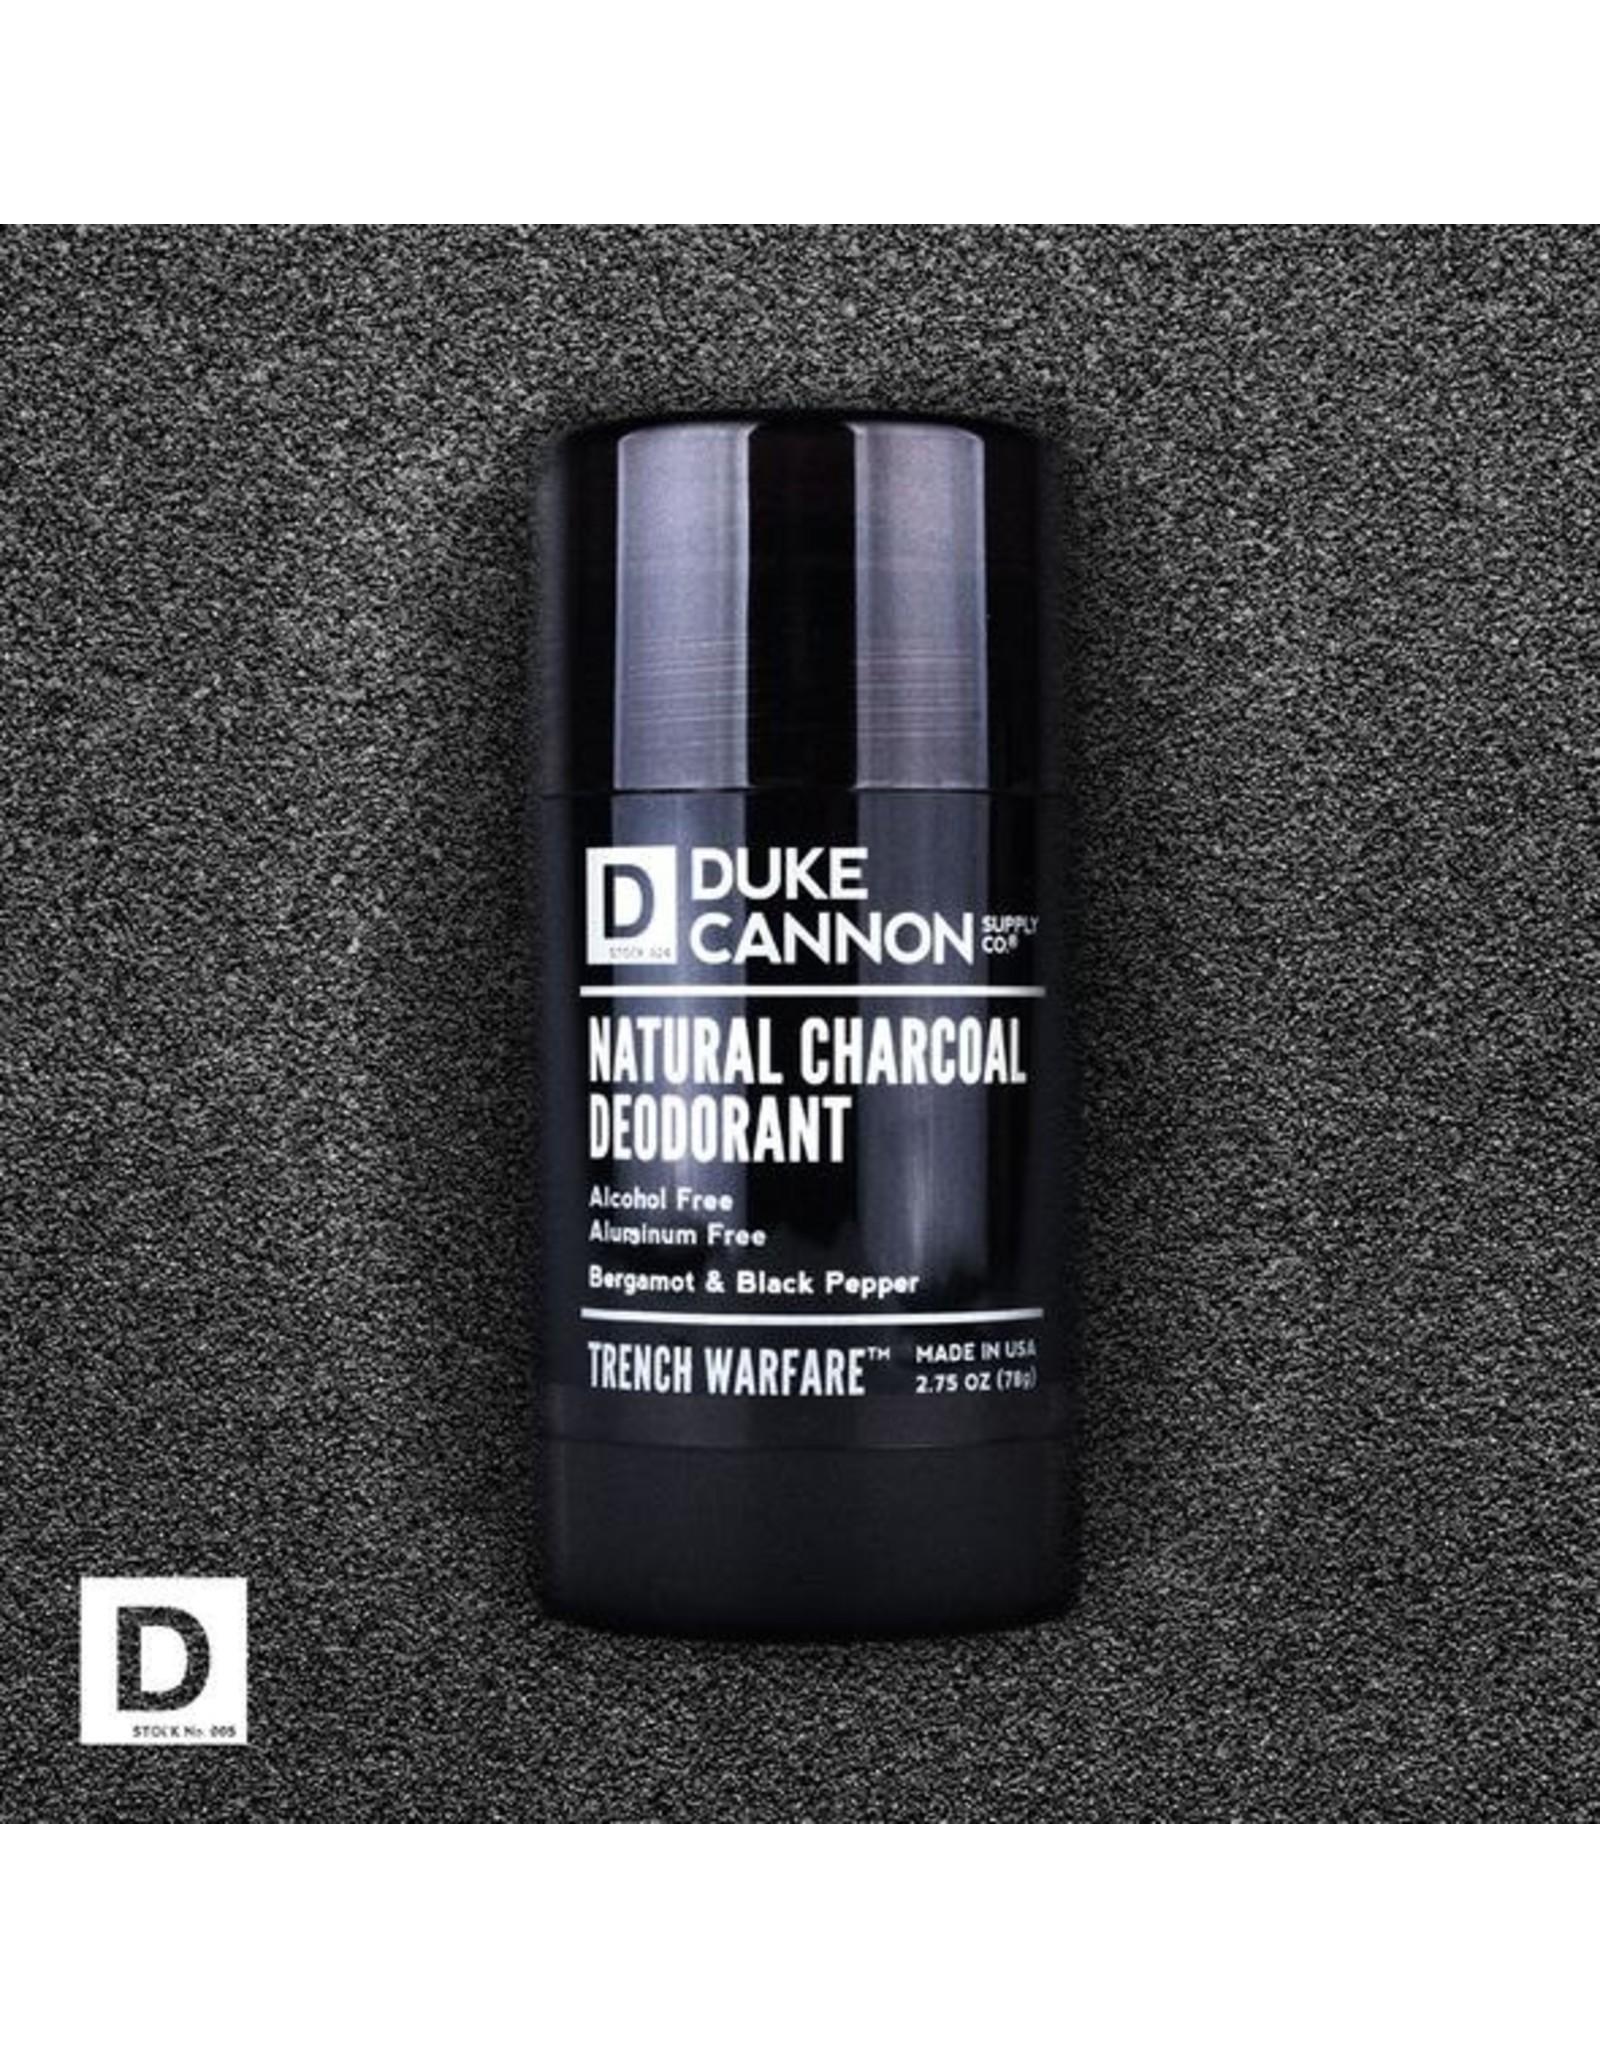 Duke Cannon Supply Co. Duke Cannon Natural Charcoal Deodorant - 2 Scents